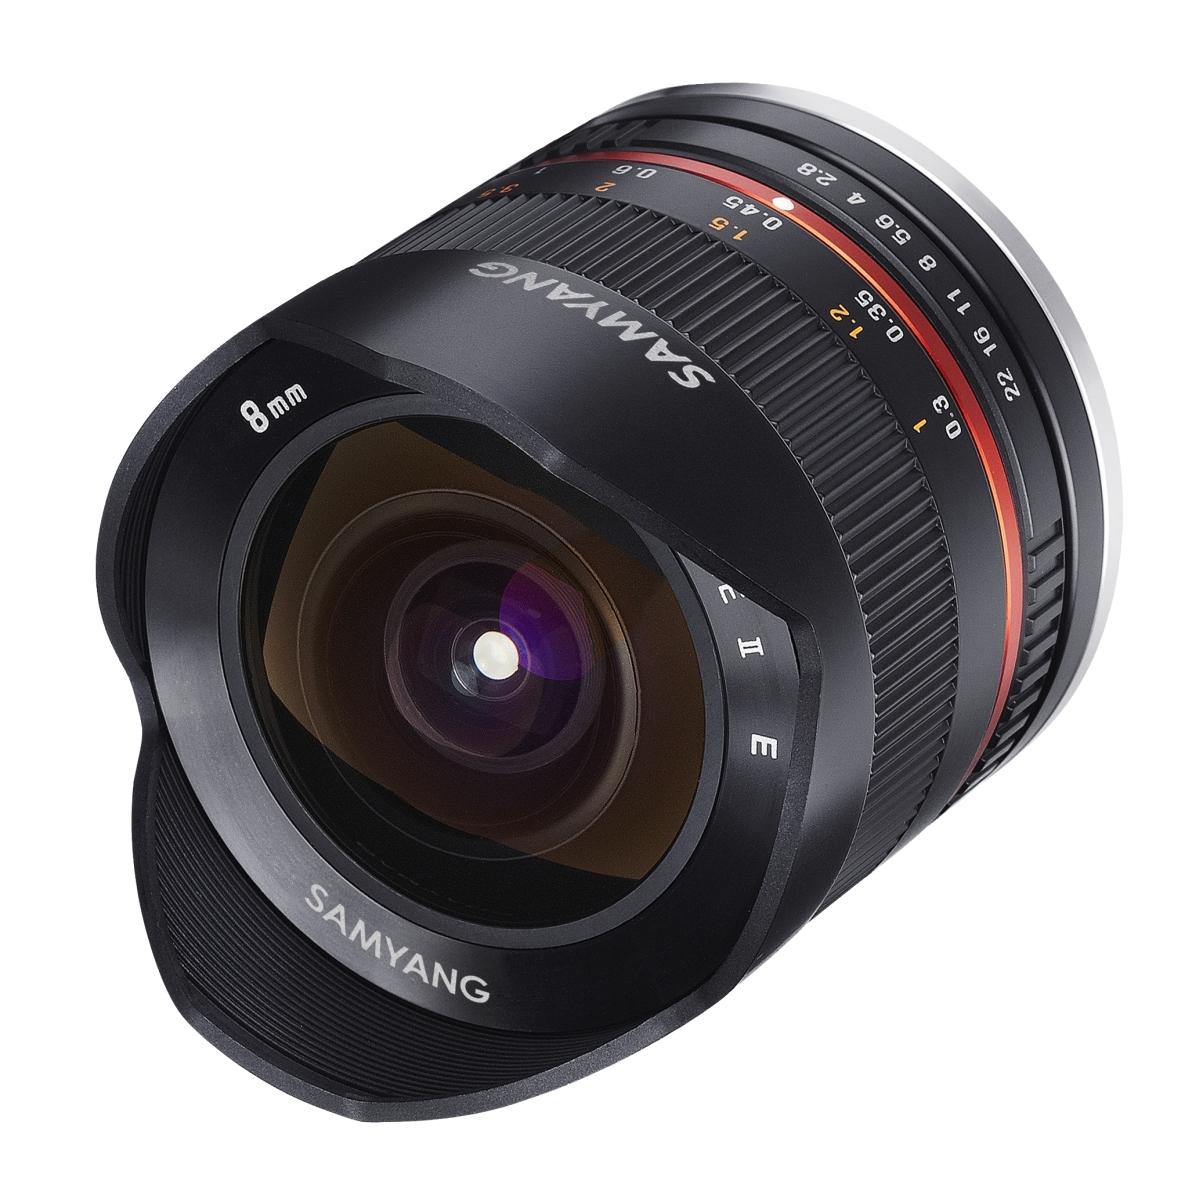 Samyang MF 8 mm 1:2,8 Fisheye II für Fujifilm XF Schwarz